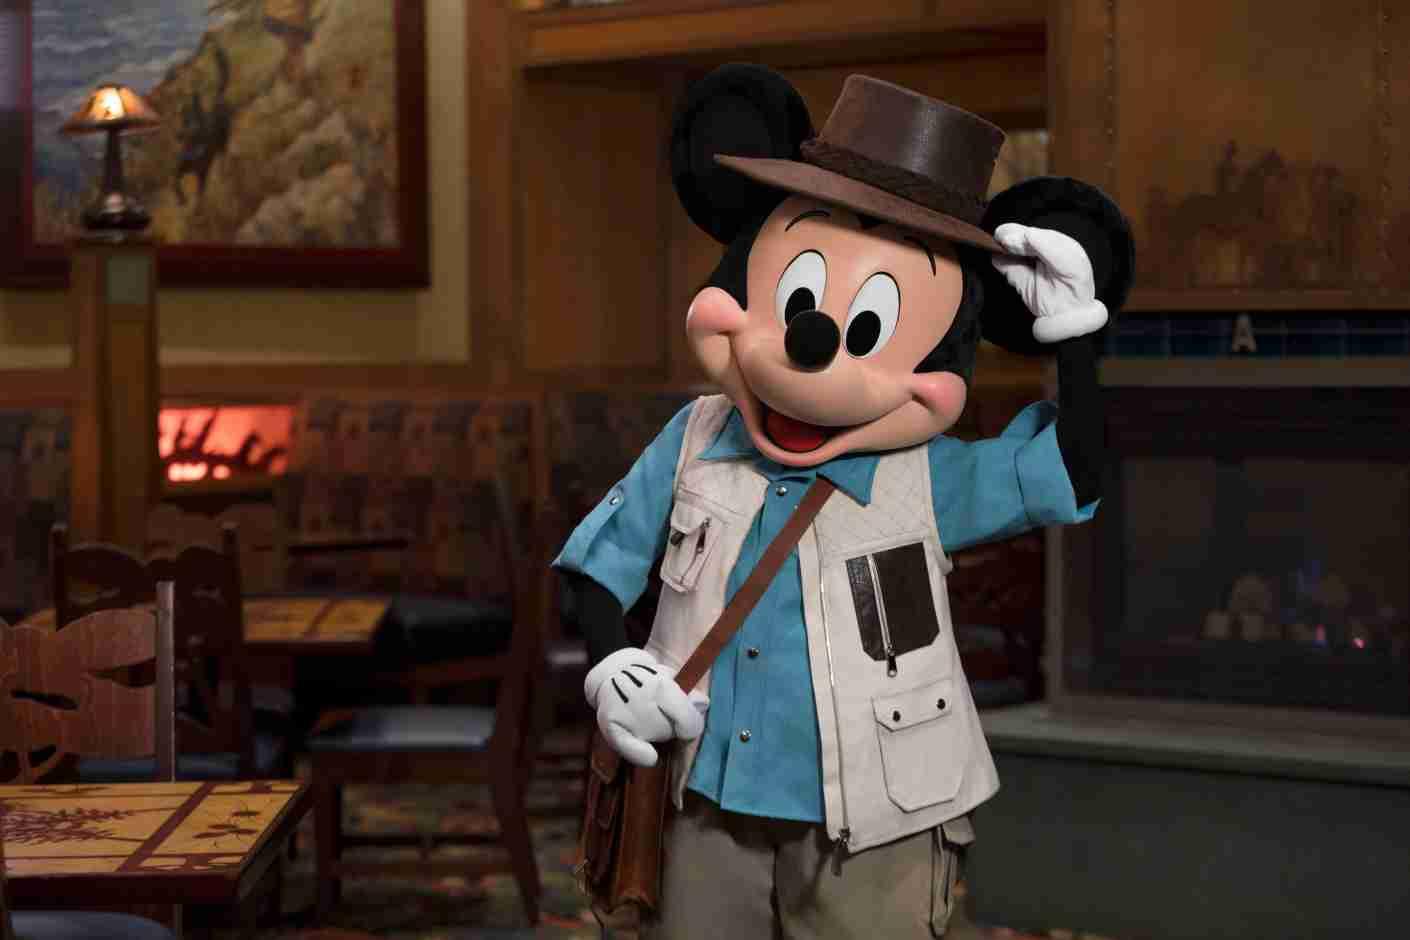 Best Disneyland Restaurants for Families - Mickeys Tales of Adventure